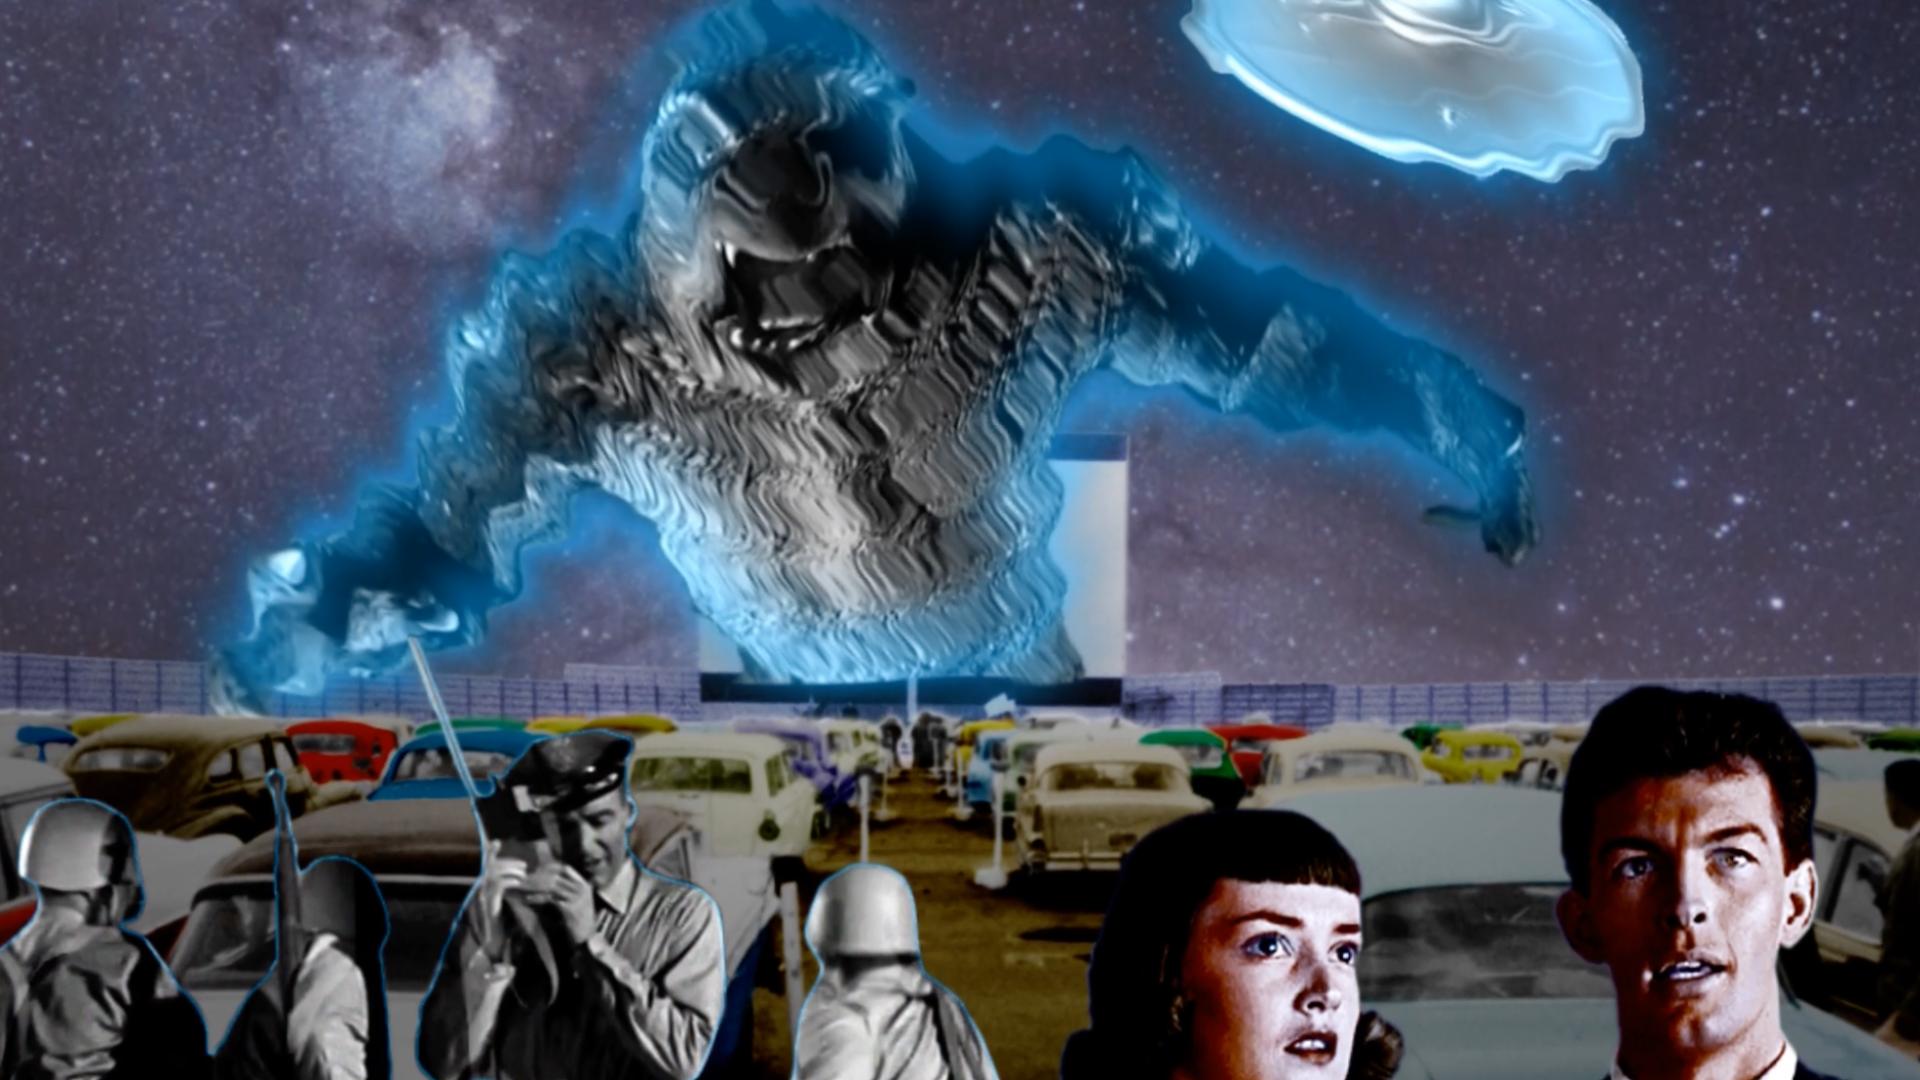 Date night in space